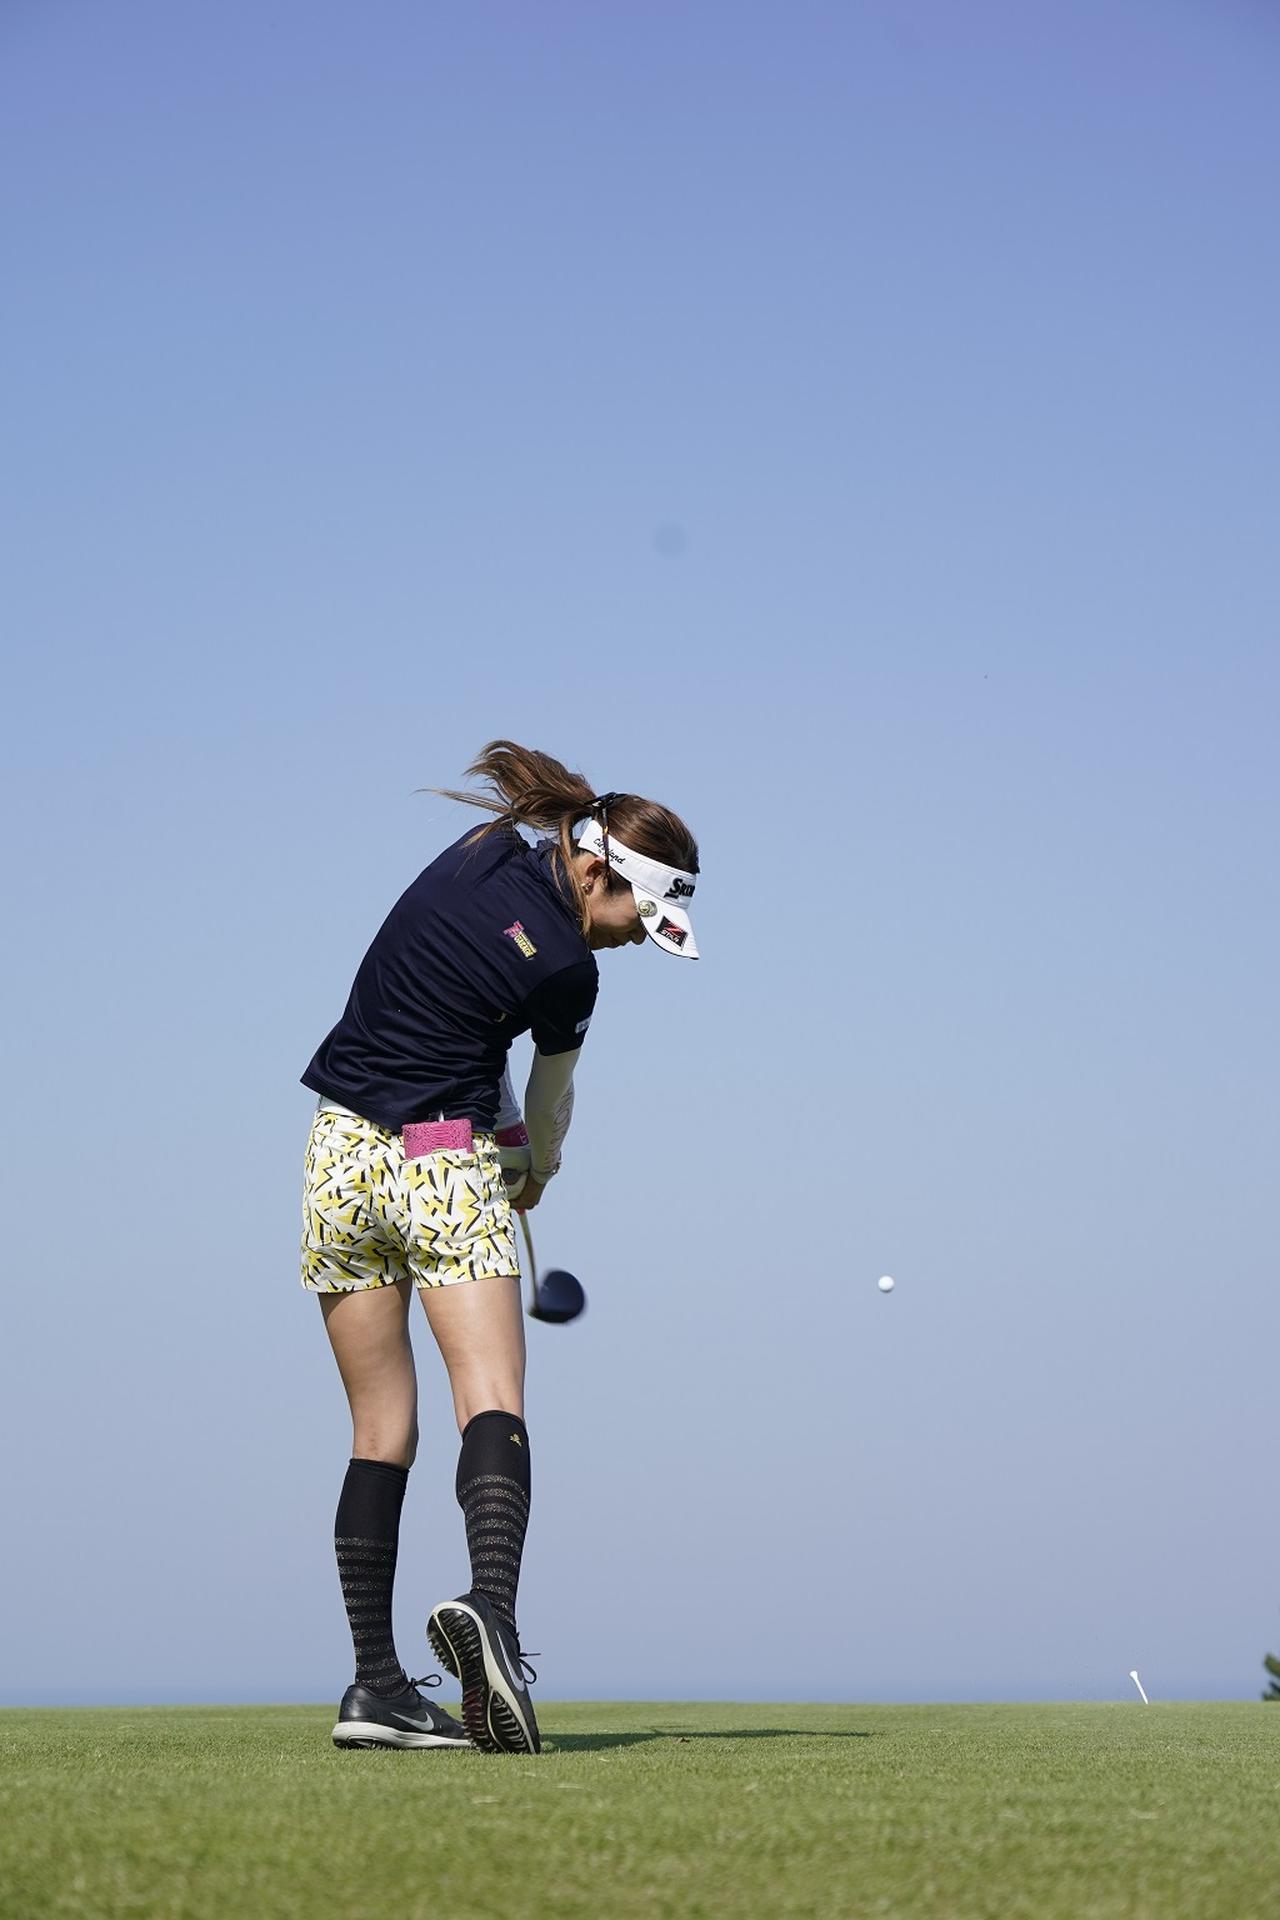 Images : 10番目の画像 - 金田久美子ドライバー後方連続写真 - みんなのゴルフダイジェスト